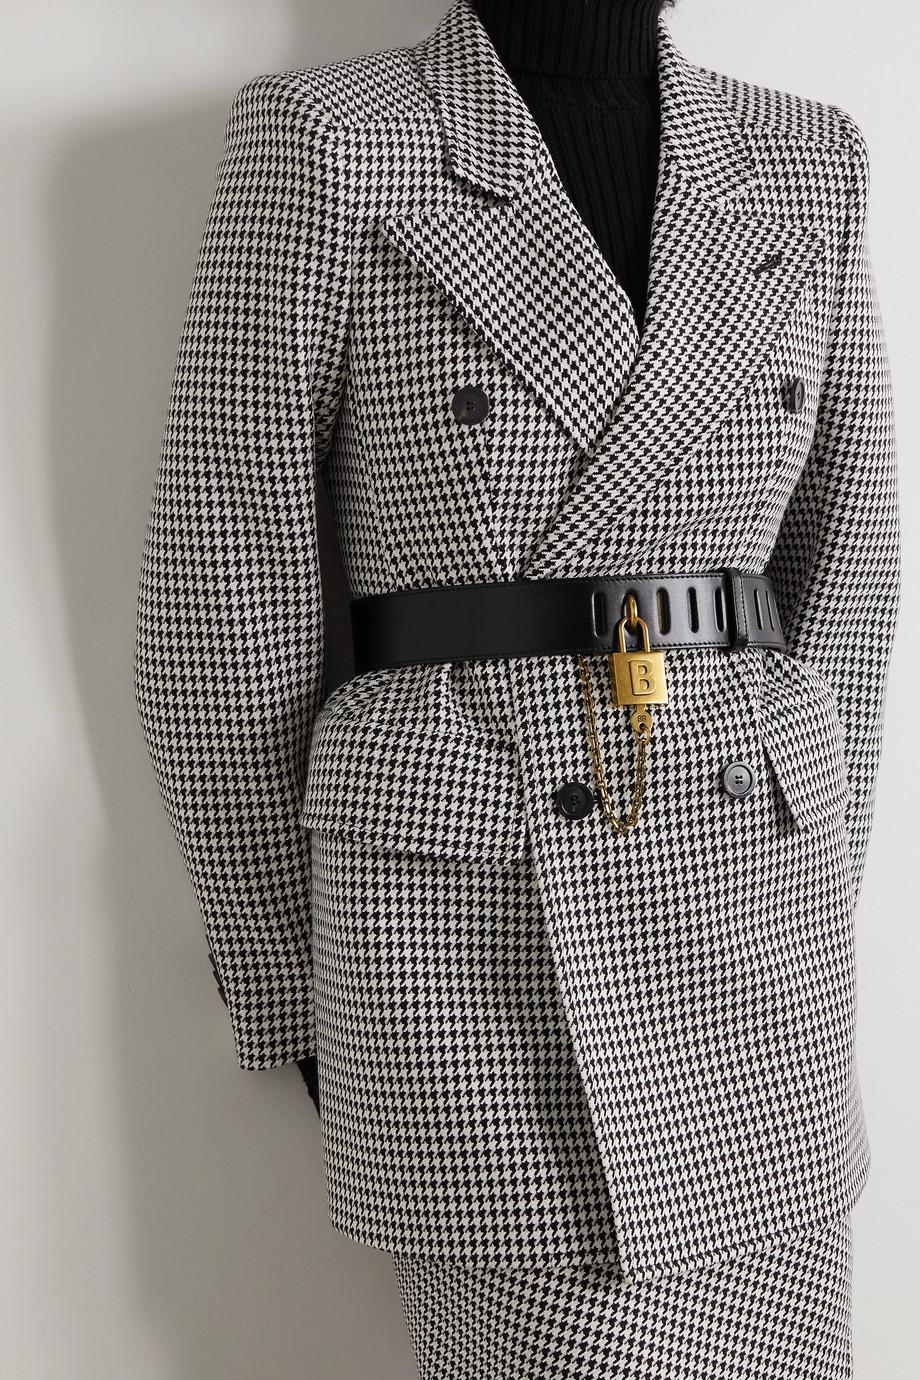 Balenciaga Chain-embellished leather belt